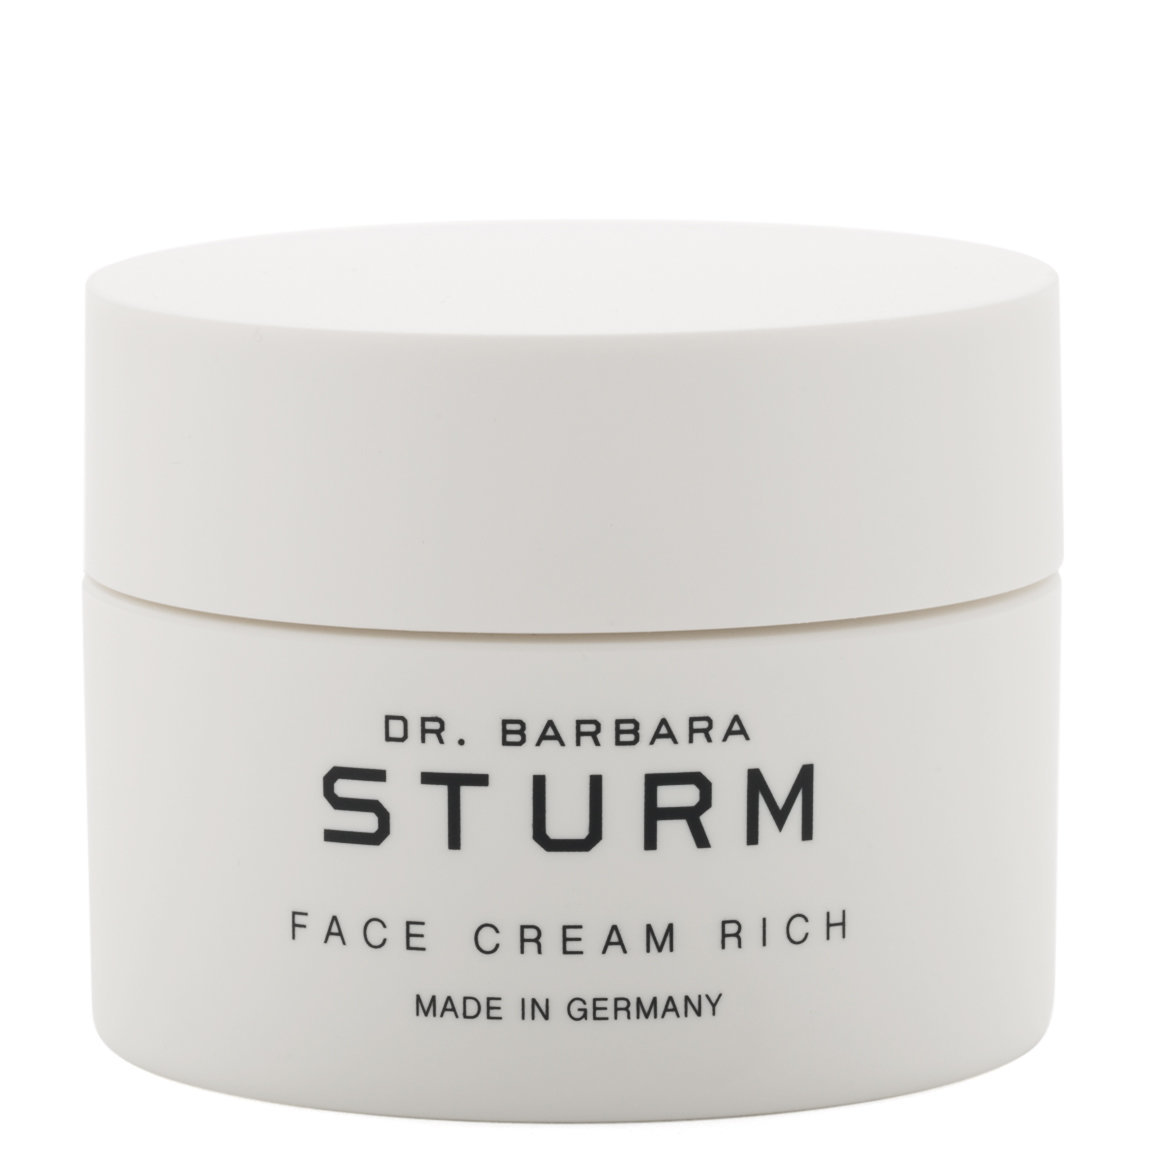 Dr. Barbara Sturm Face Cream Rich Women alternative view 1 - product swatch.